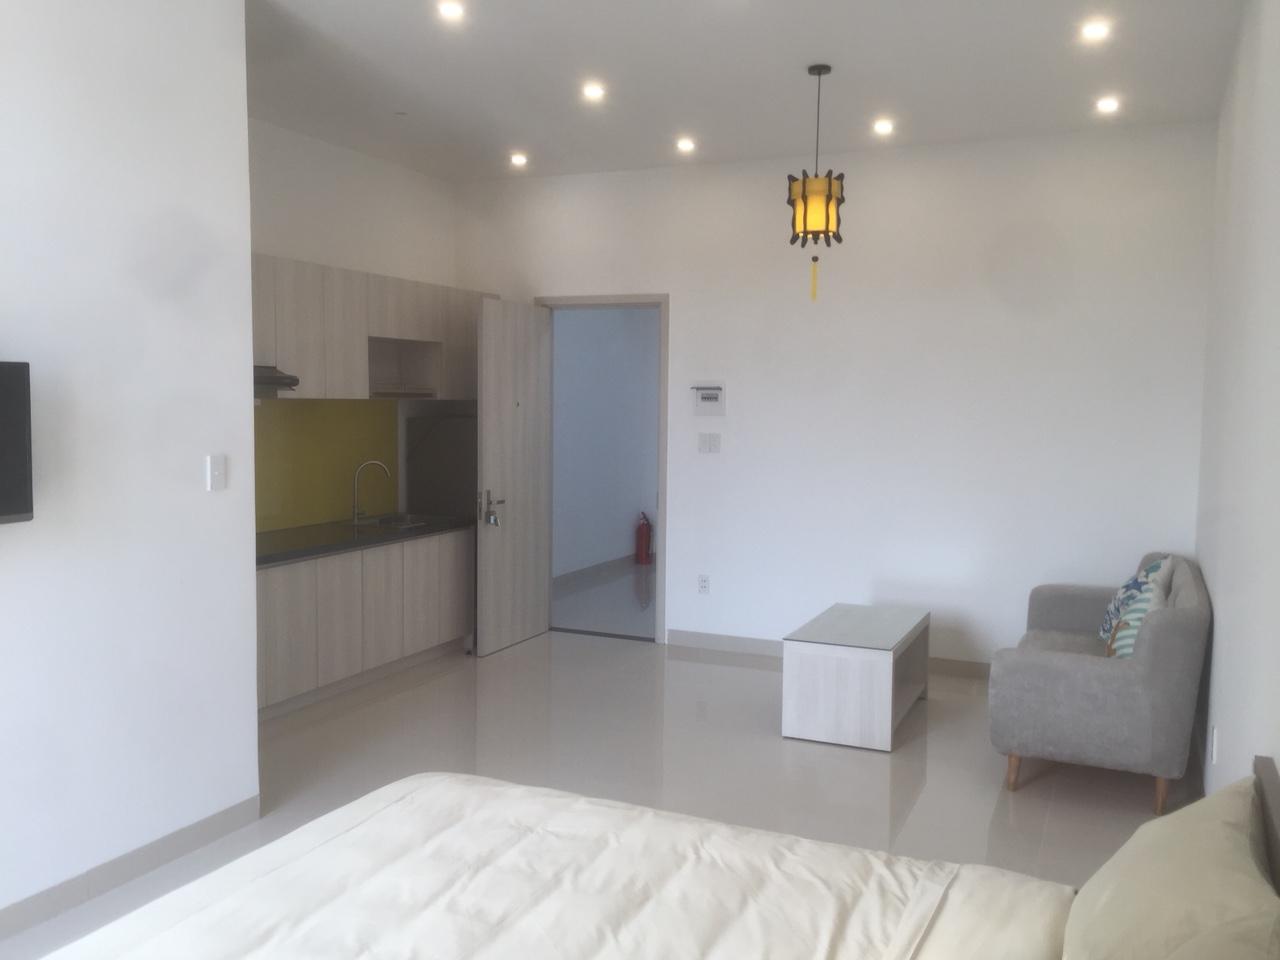 7 studio rooms apartment building for rent